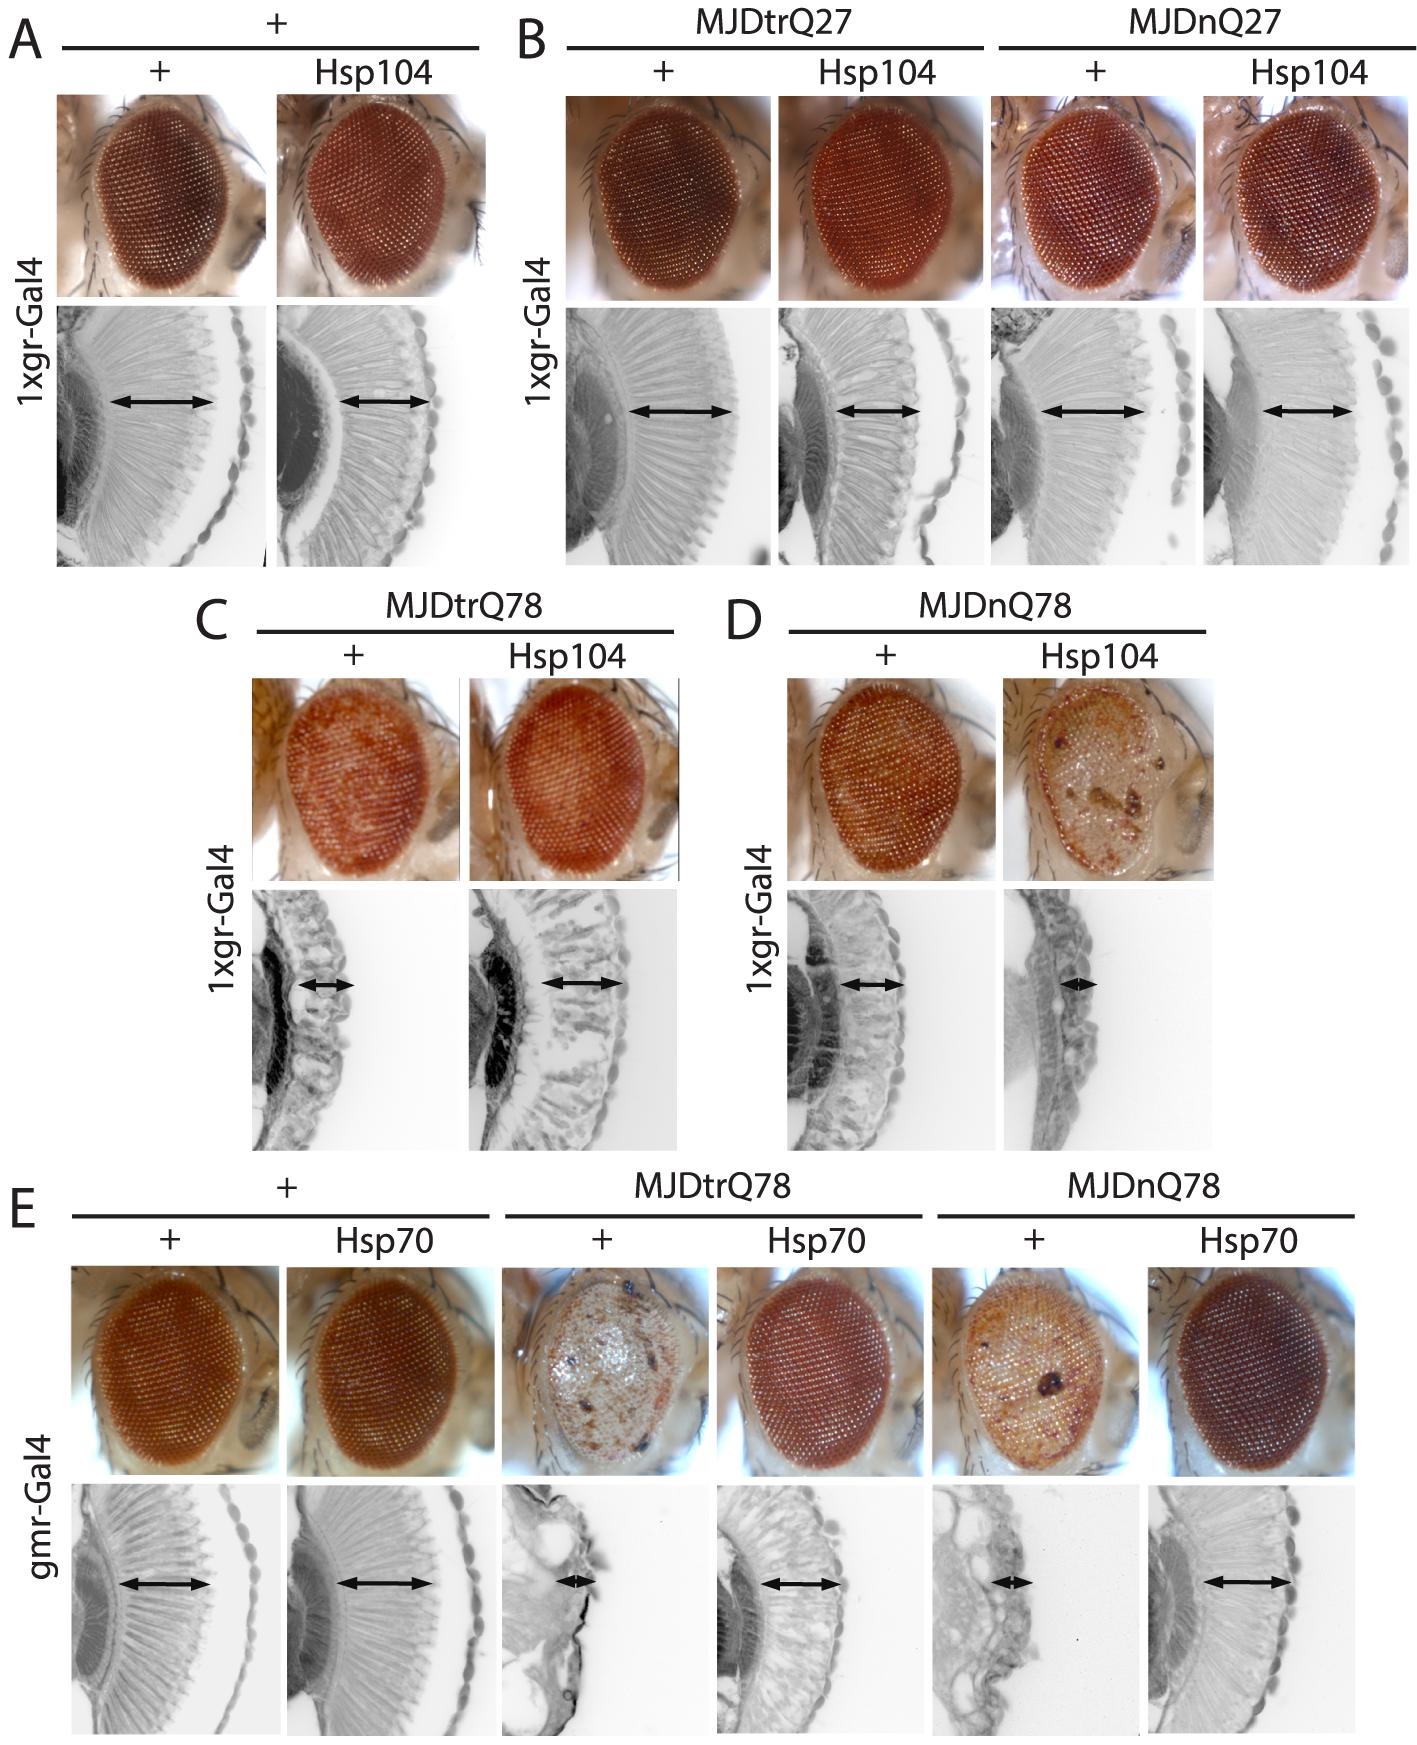 Hsp104 mitigates toxicity of Truncated MJD but enhances toxicity of Full-length MJD.